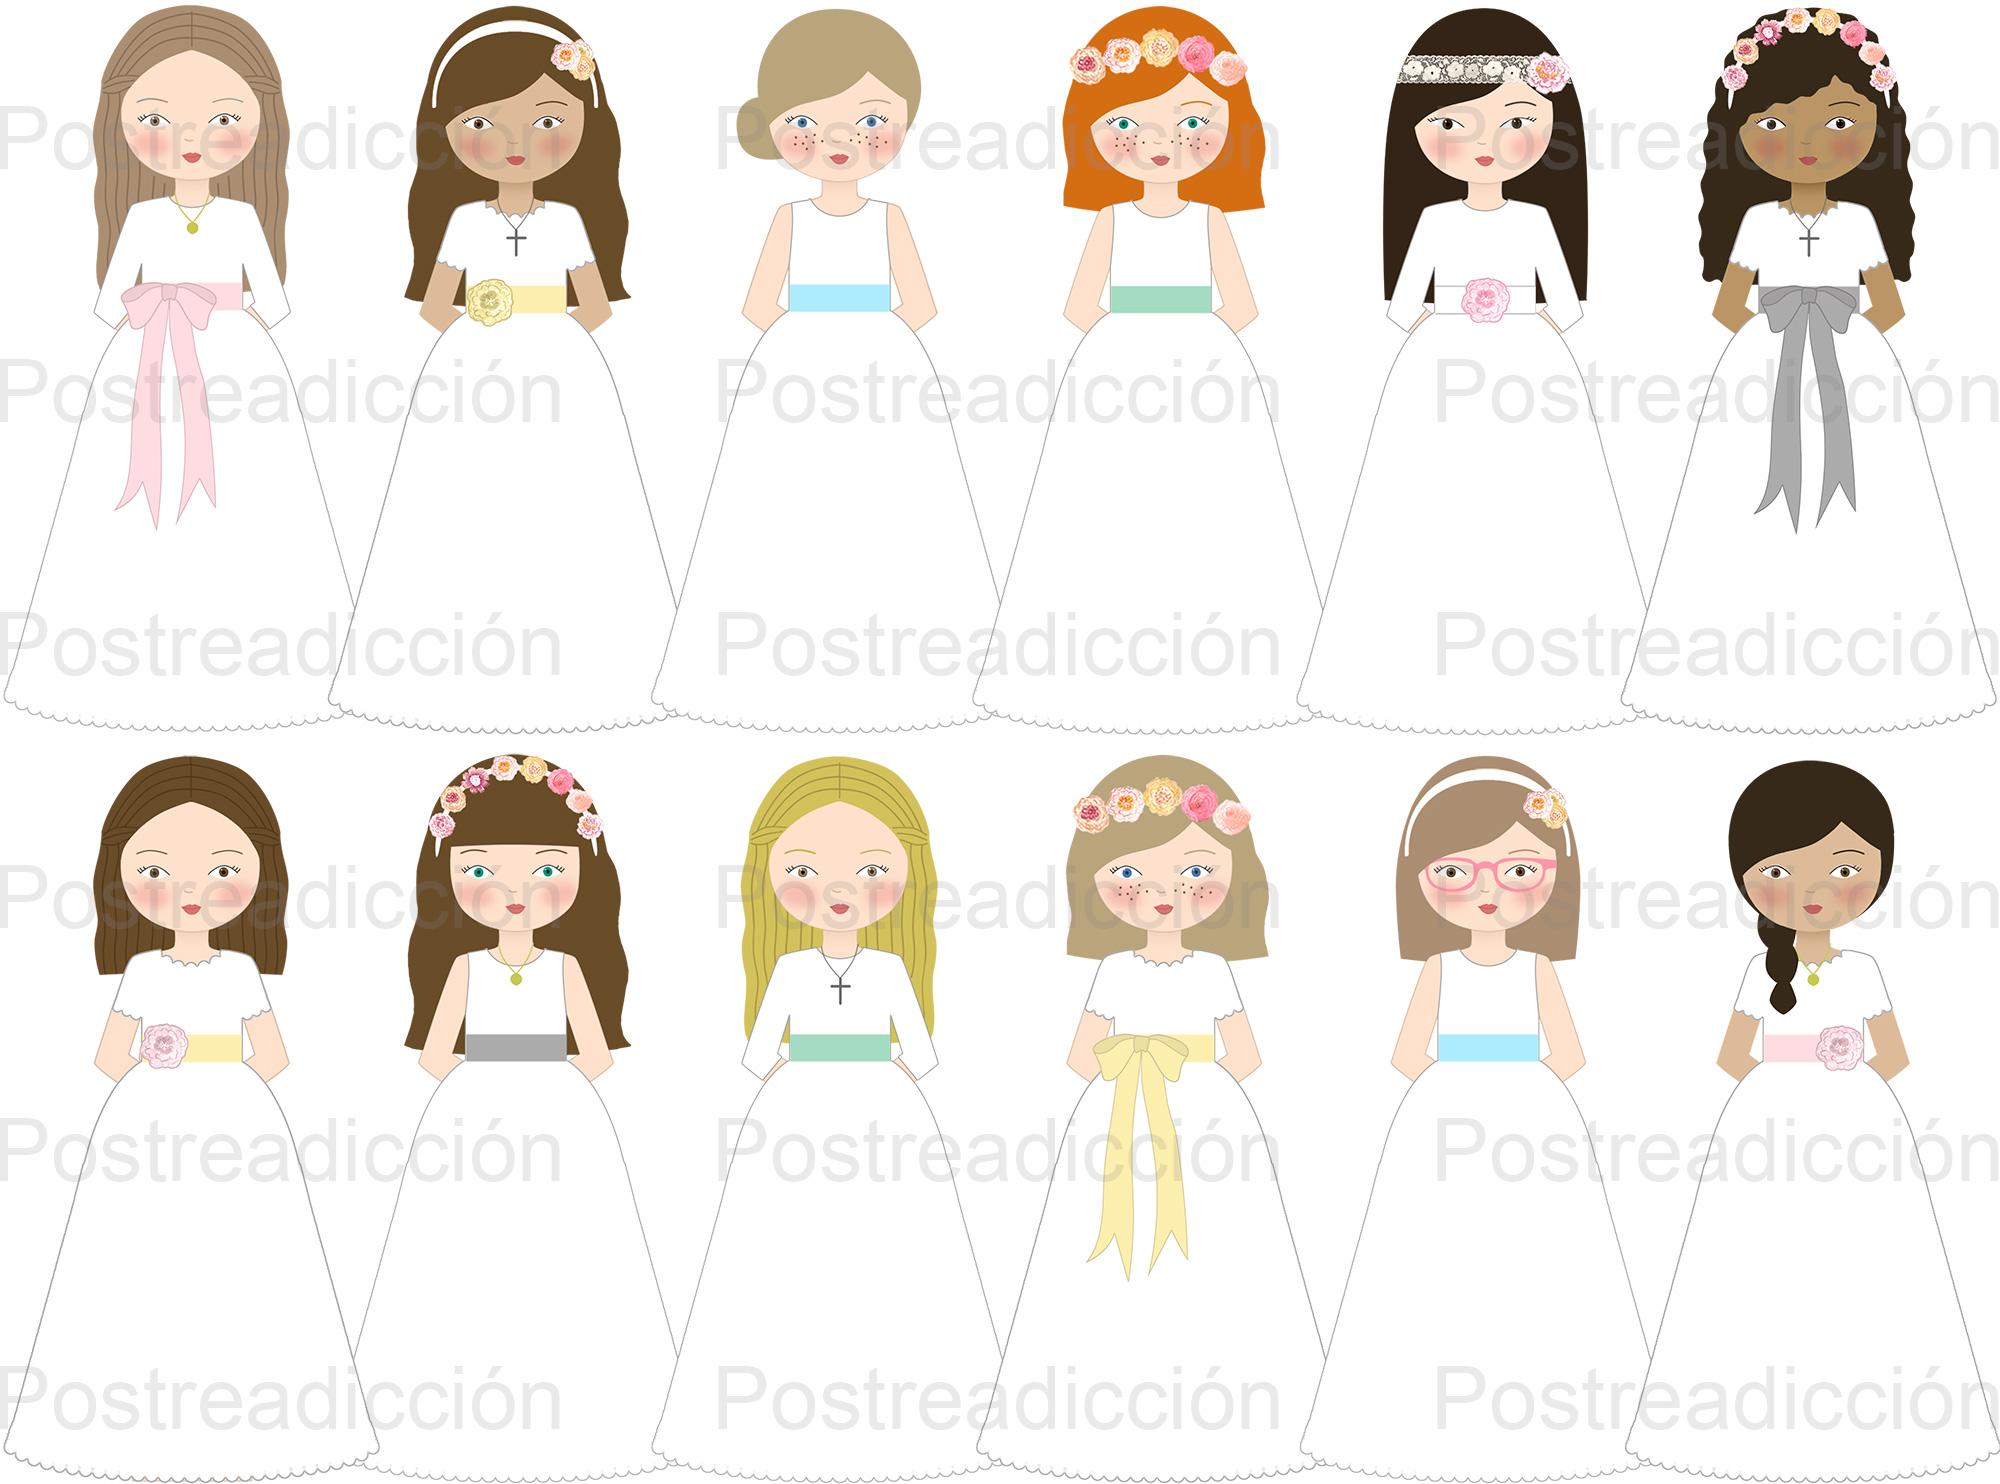 Imagen de producto: https://tienda.postreadiccion.com/img/articulos/secundarias7470-modelo-no-859-nina-de-comunion-carlota-1.jpg